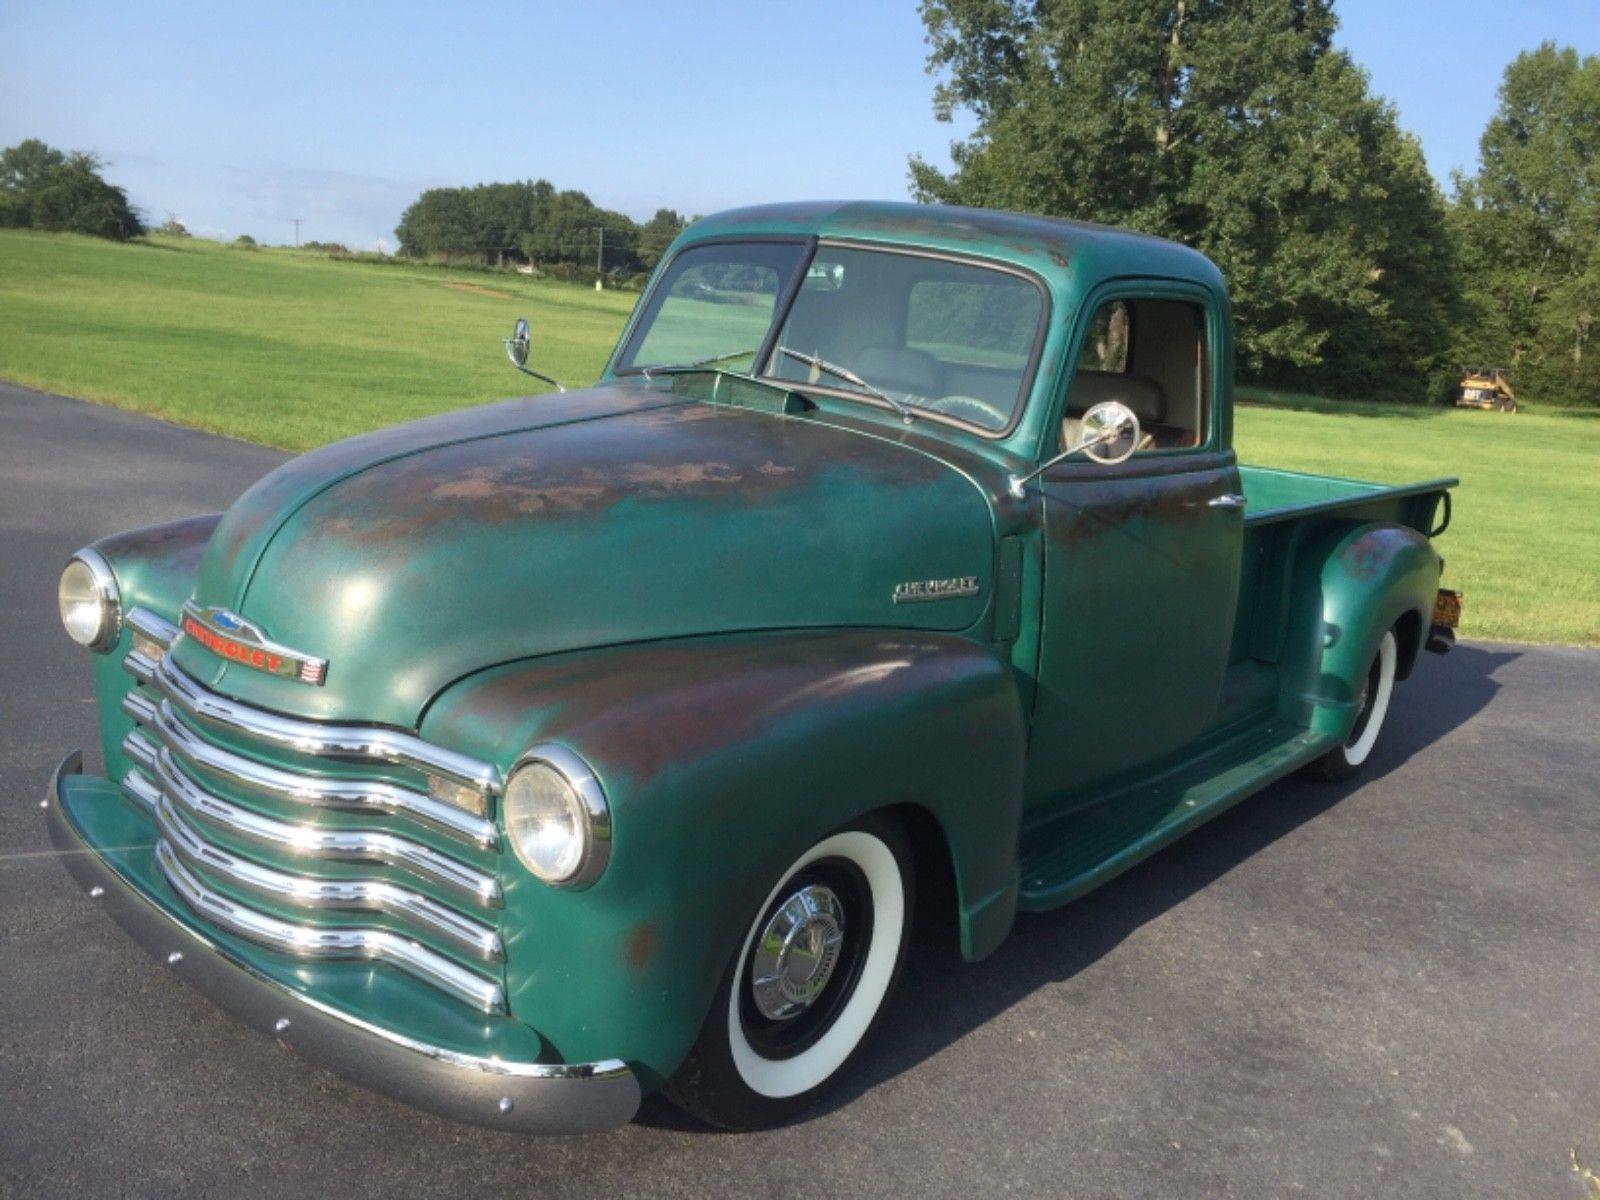 Amazing 1948 Chevrolet Other Pickups 3100 1948 Chevrolet 3100 Pickup Truck 2019